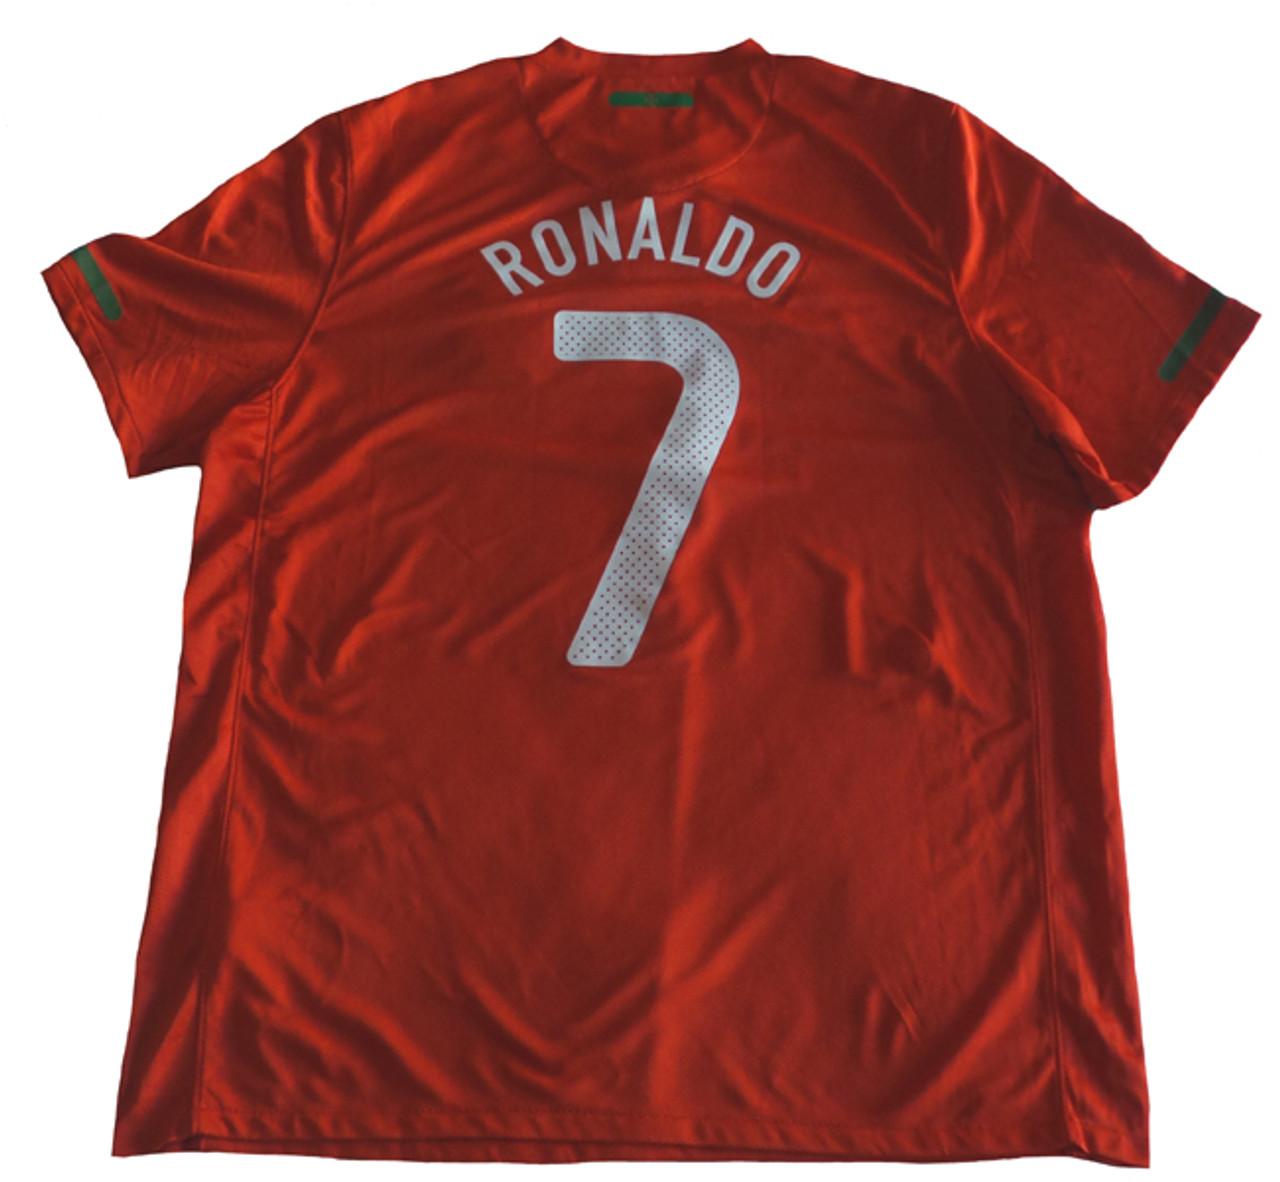 buy online ac9e4 a84f8 nike portugal ronaldo jersey